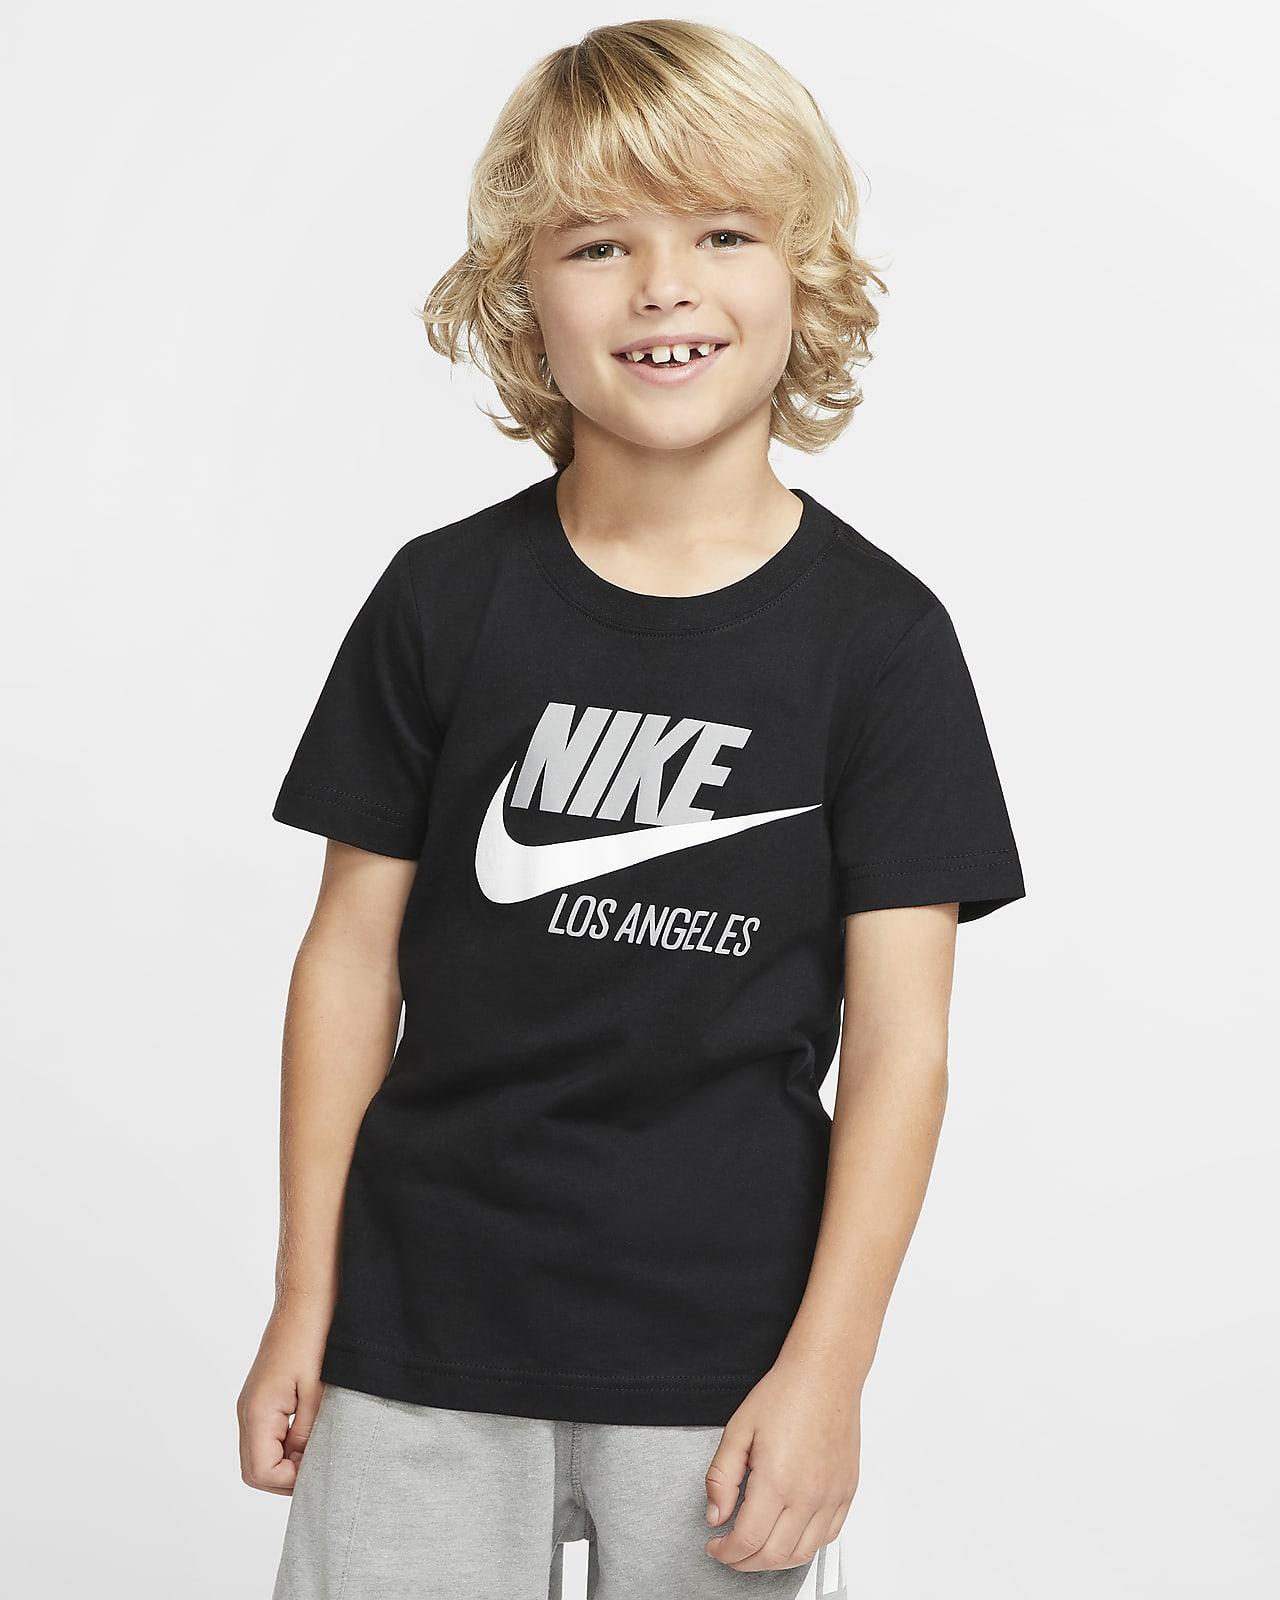 Playera de manga corta para niños talla pequeña Nike Sportswear Los Angeles